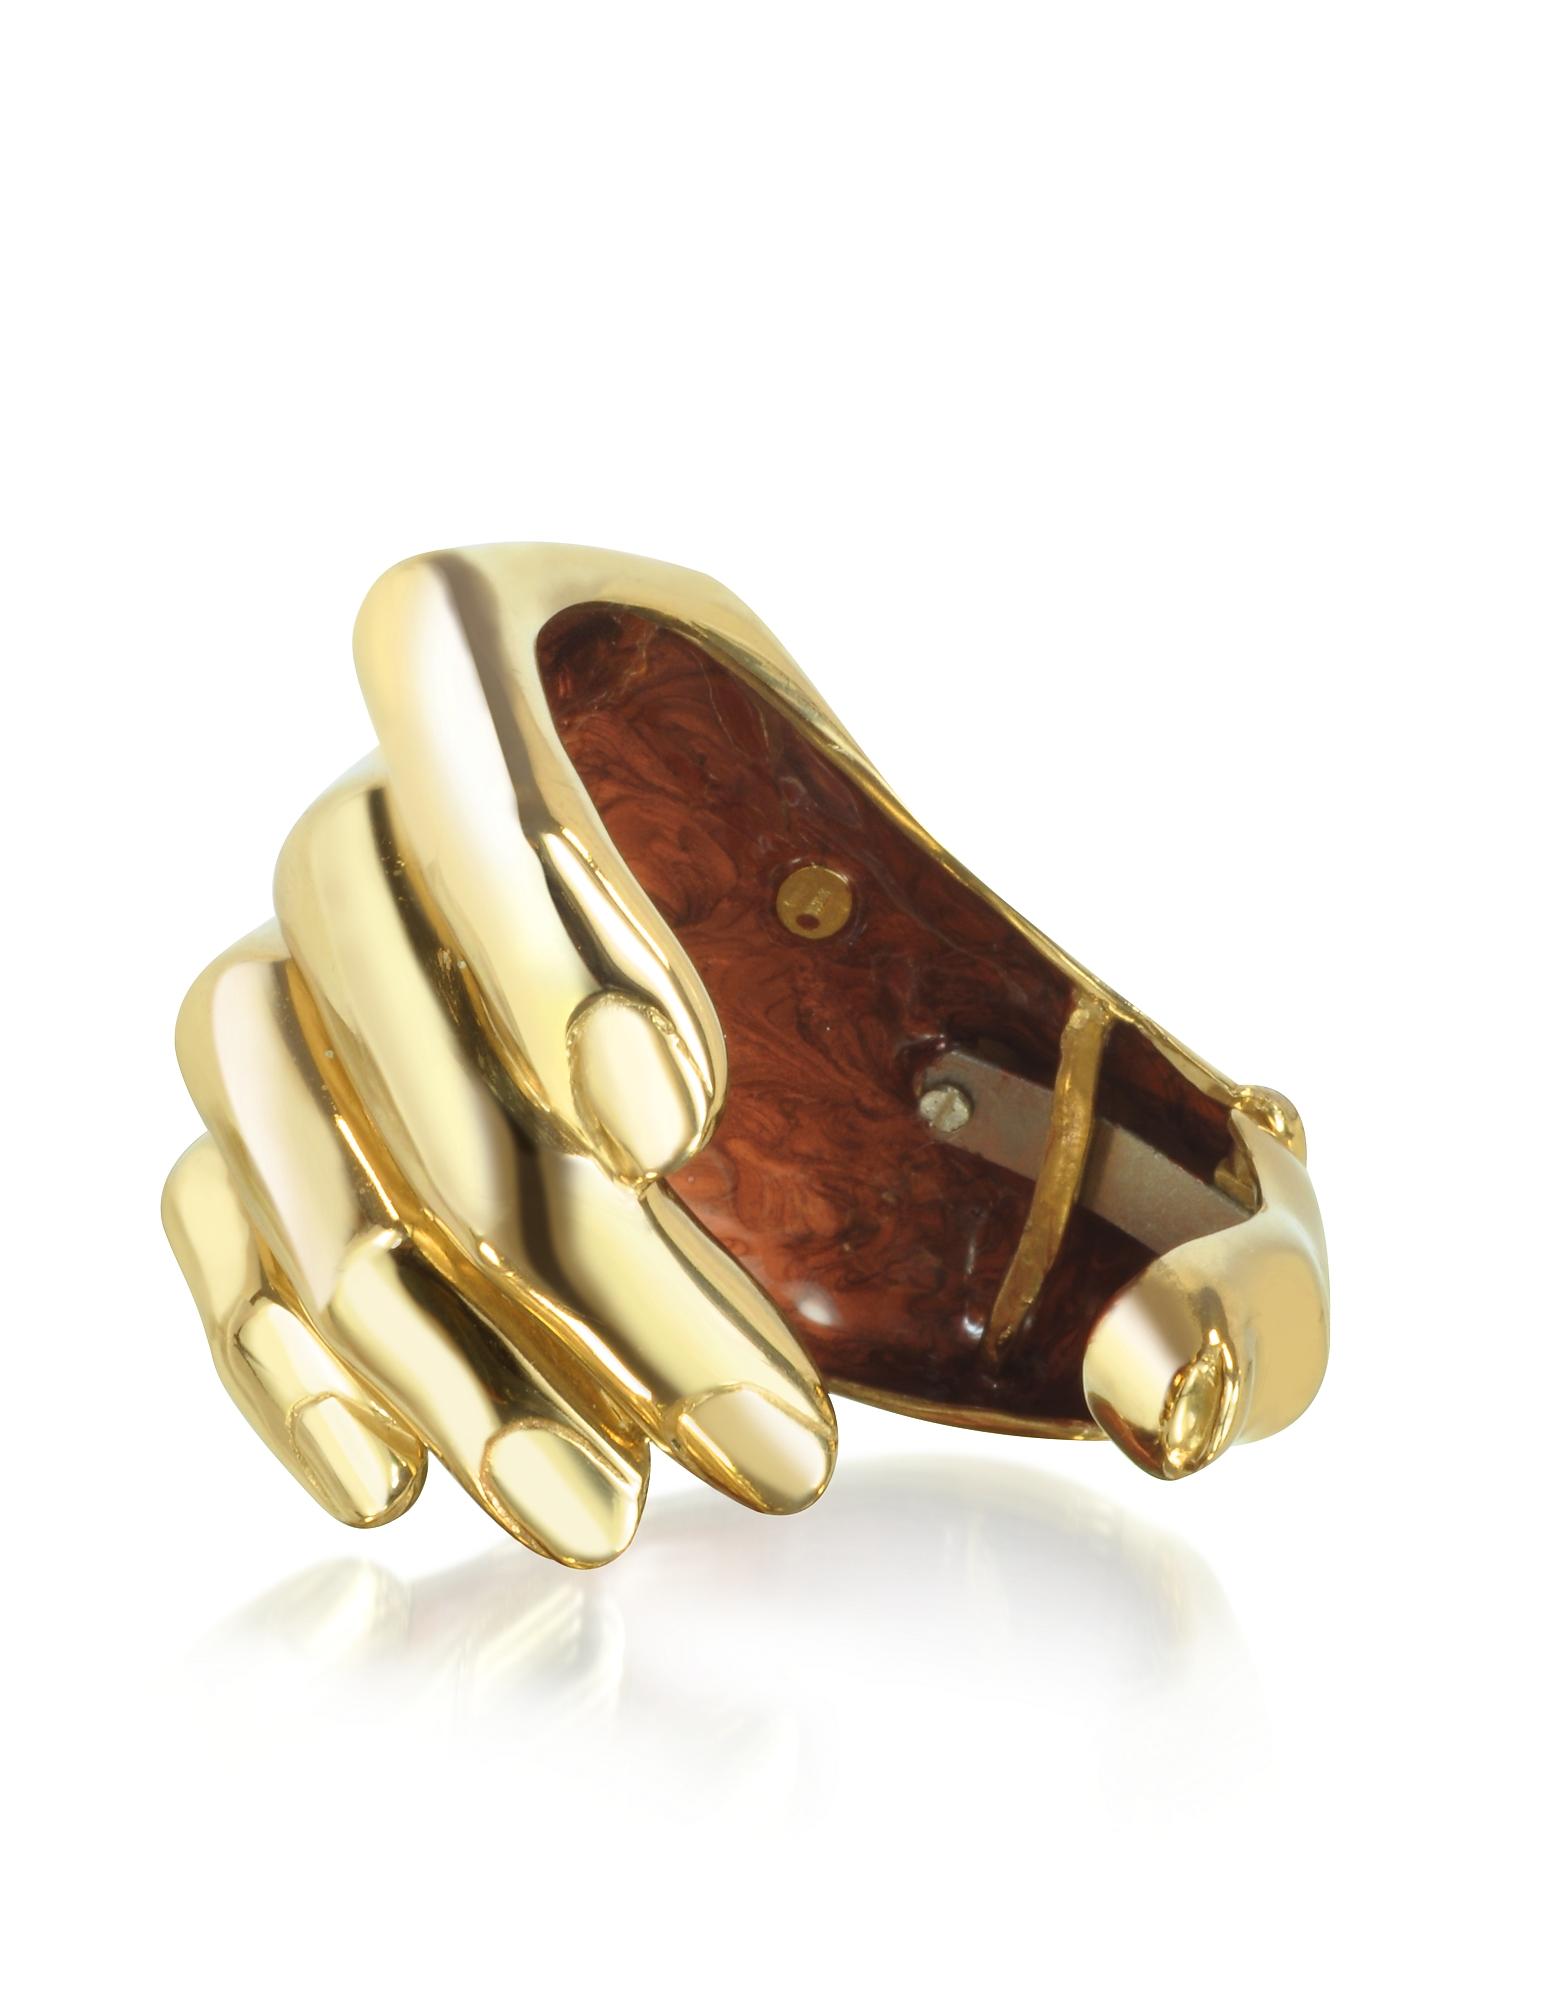 Bernard Delettrez Bracelets, Hand Bronze Cuff Bracelet